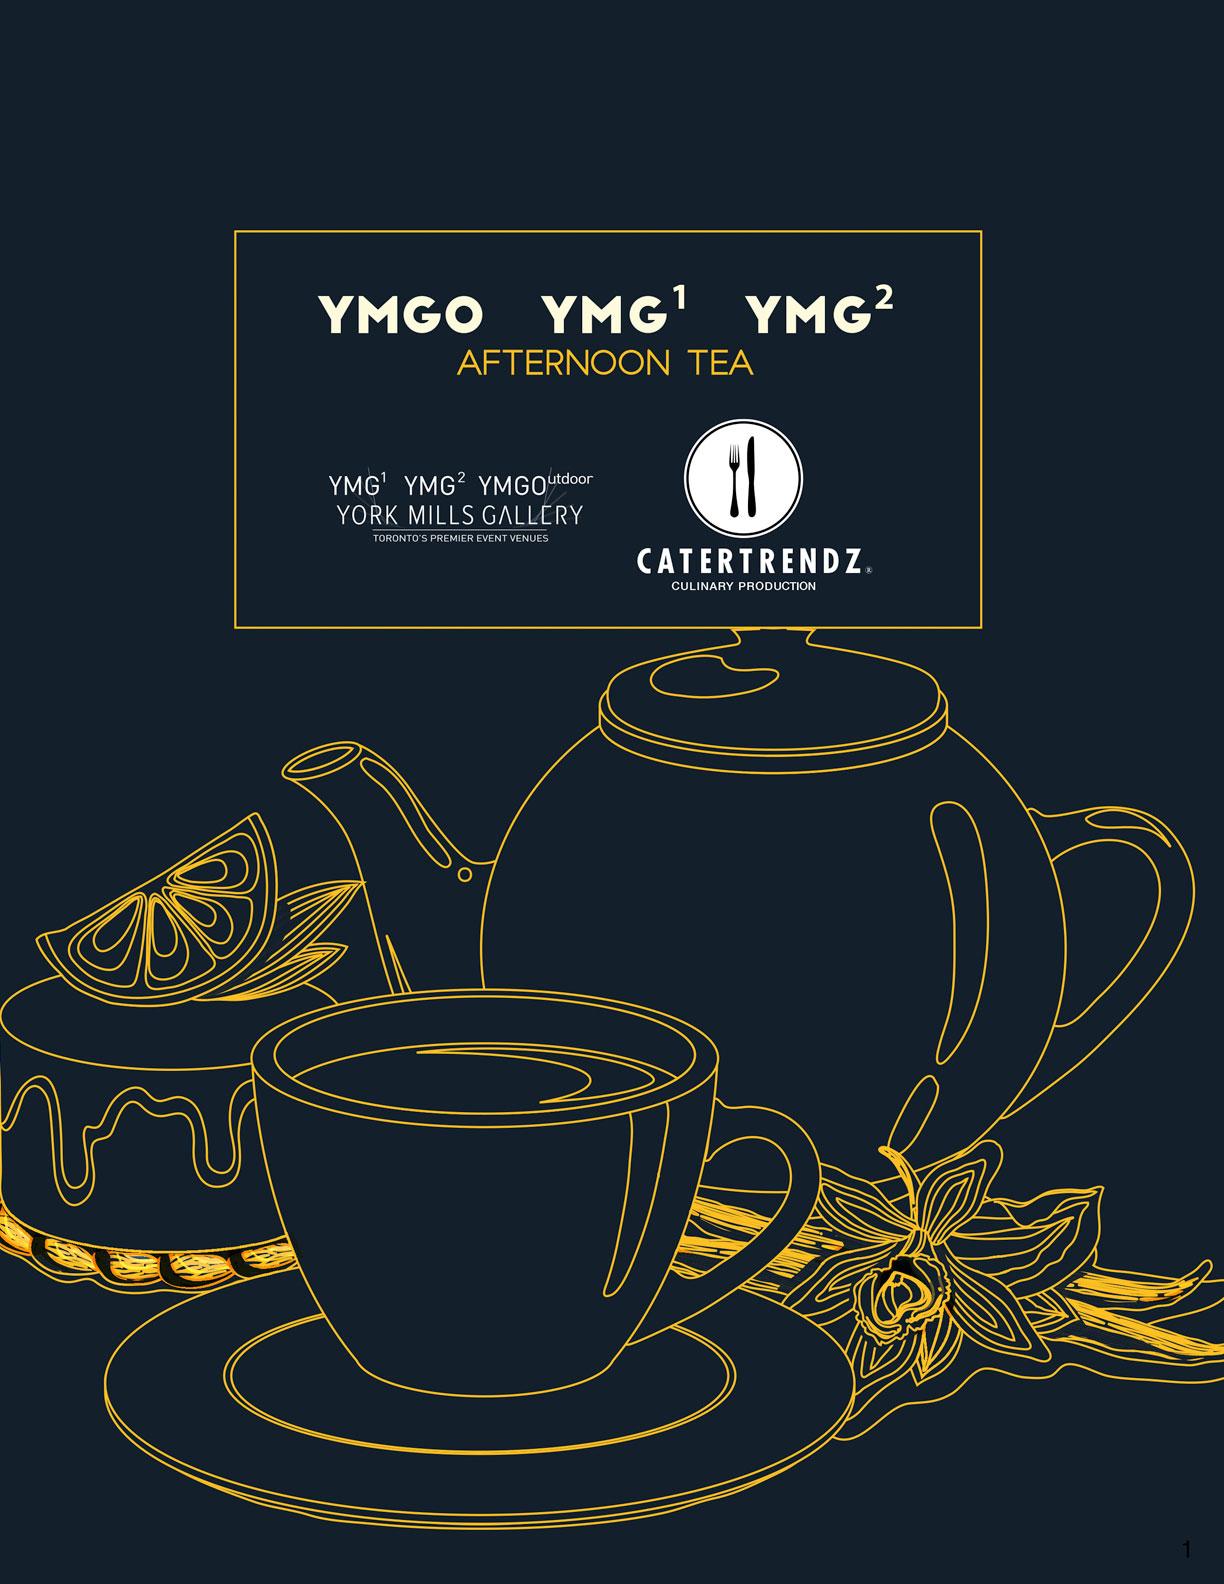 YMG Afternoon Tea